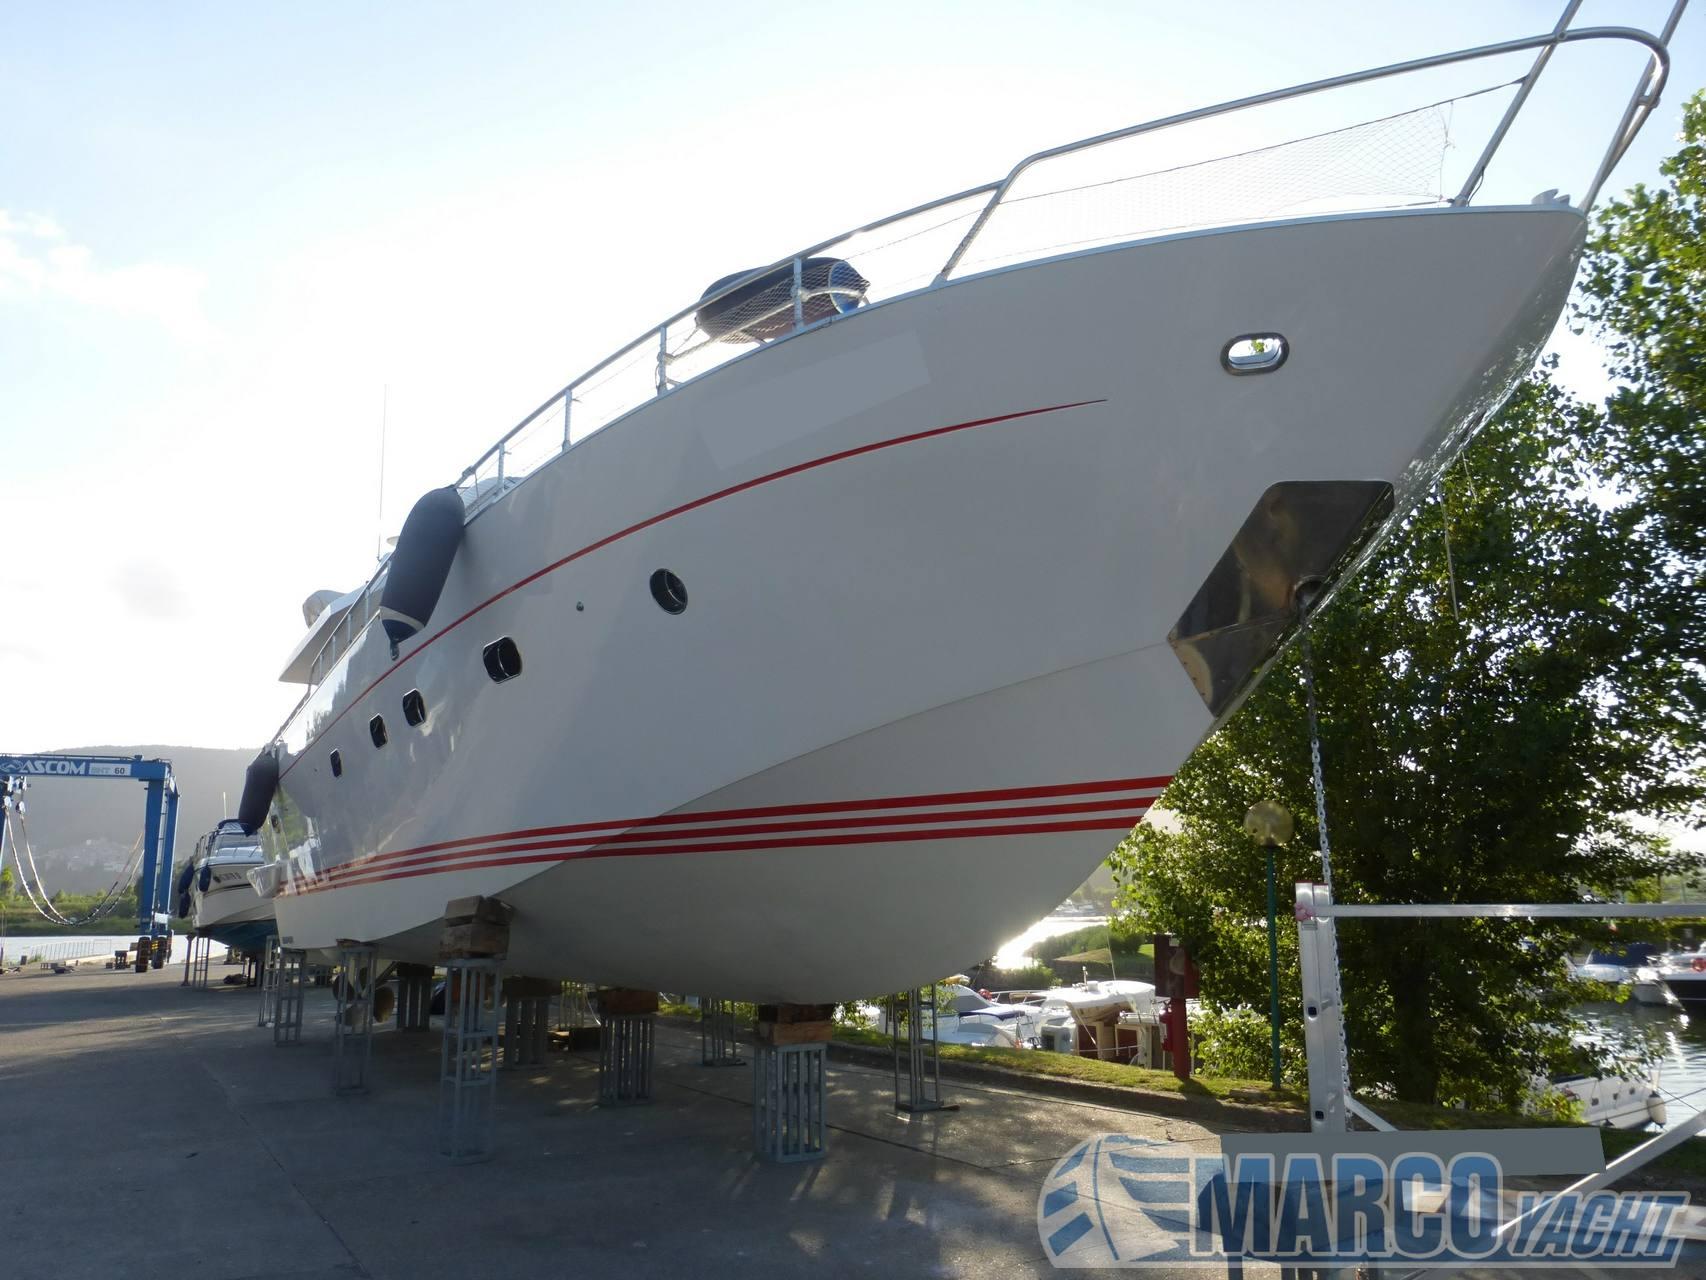 Cantieri navali liguri Ghibli - charter motor boat